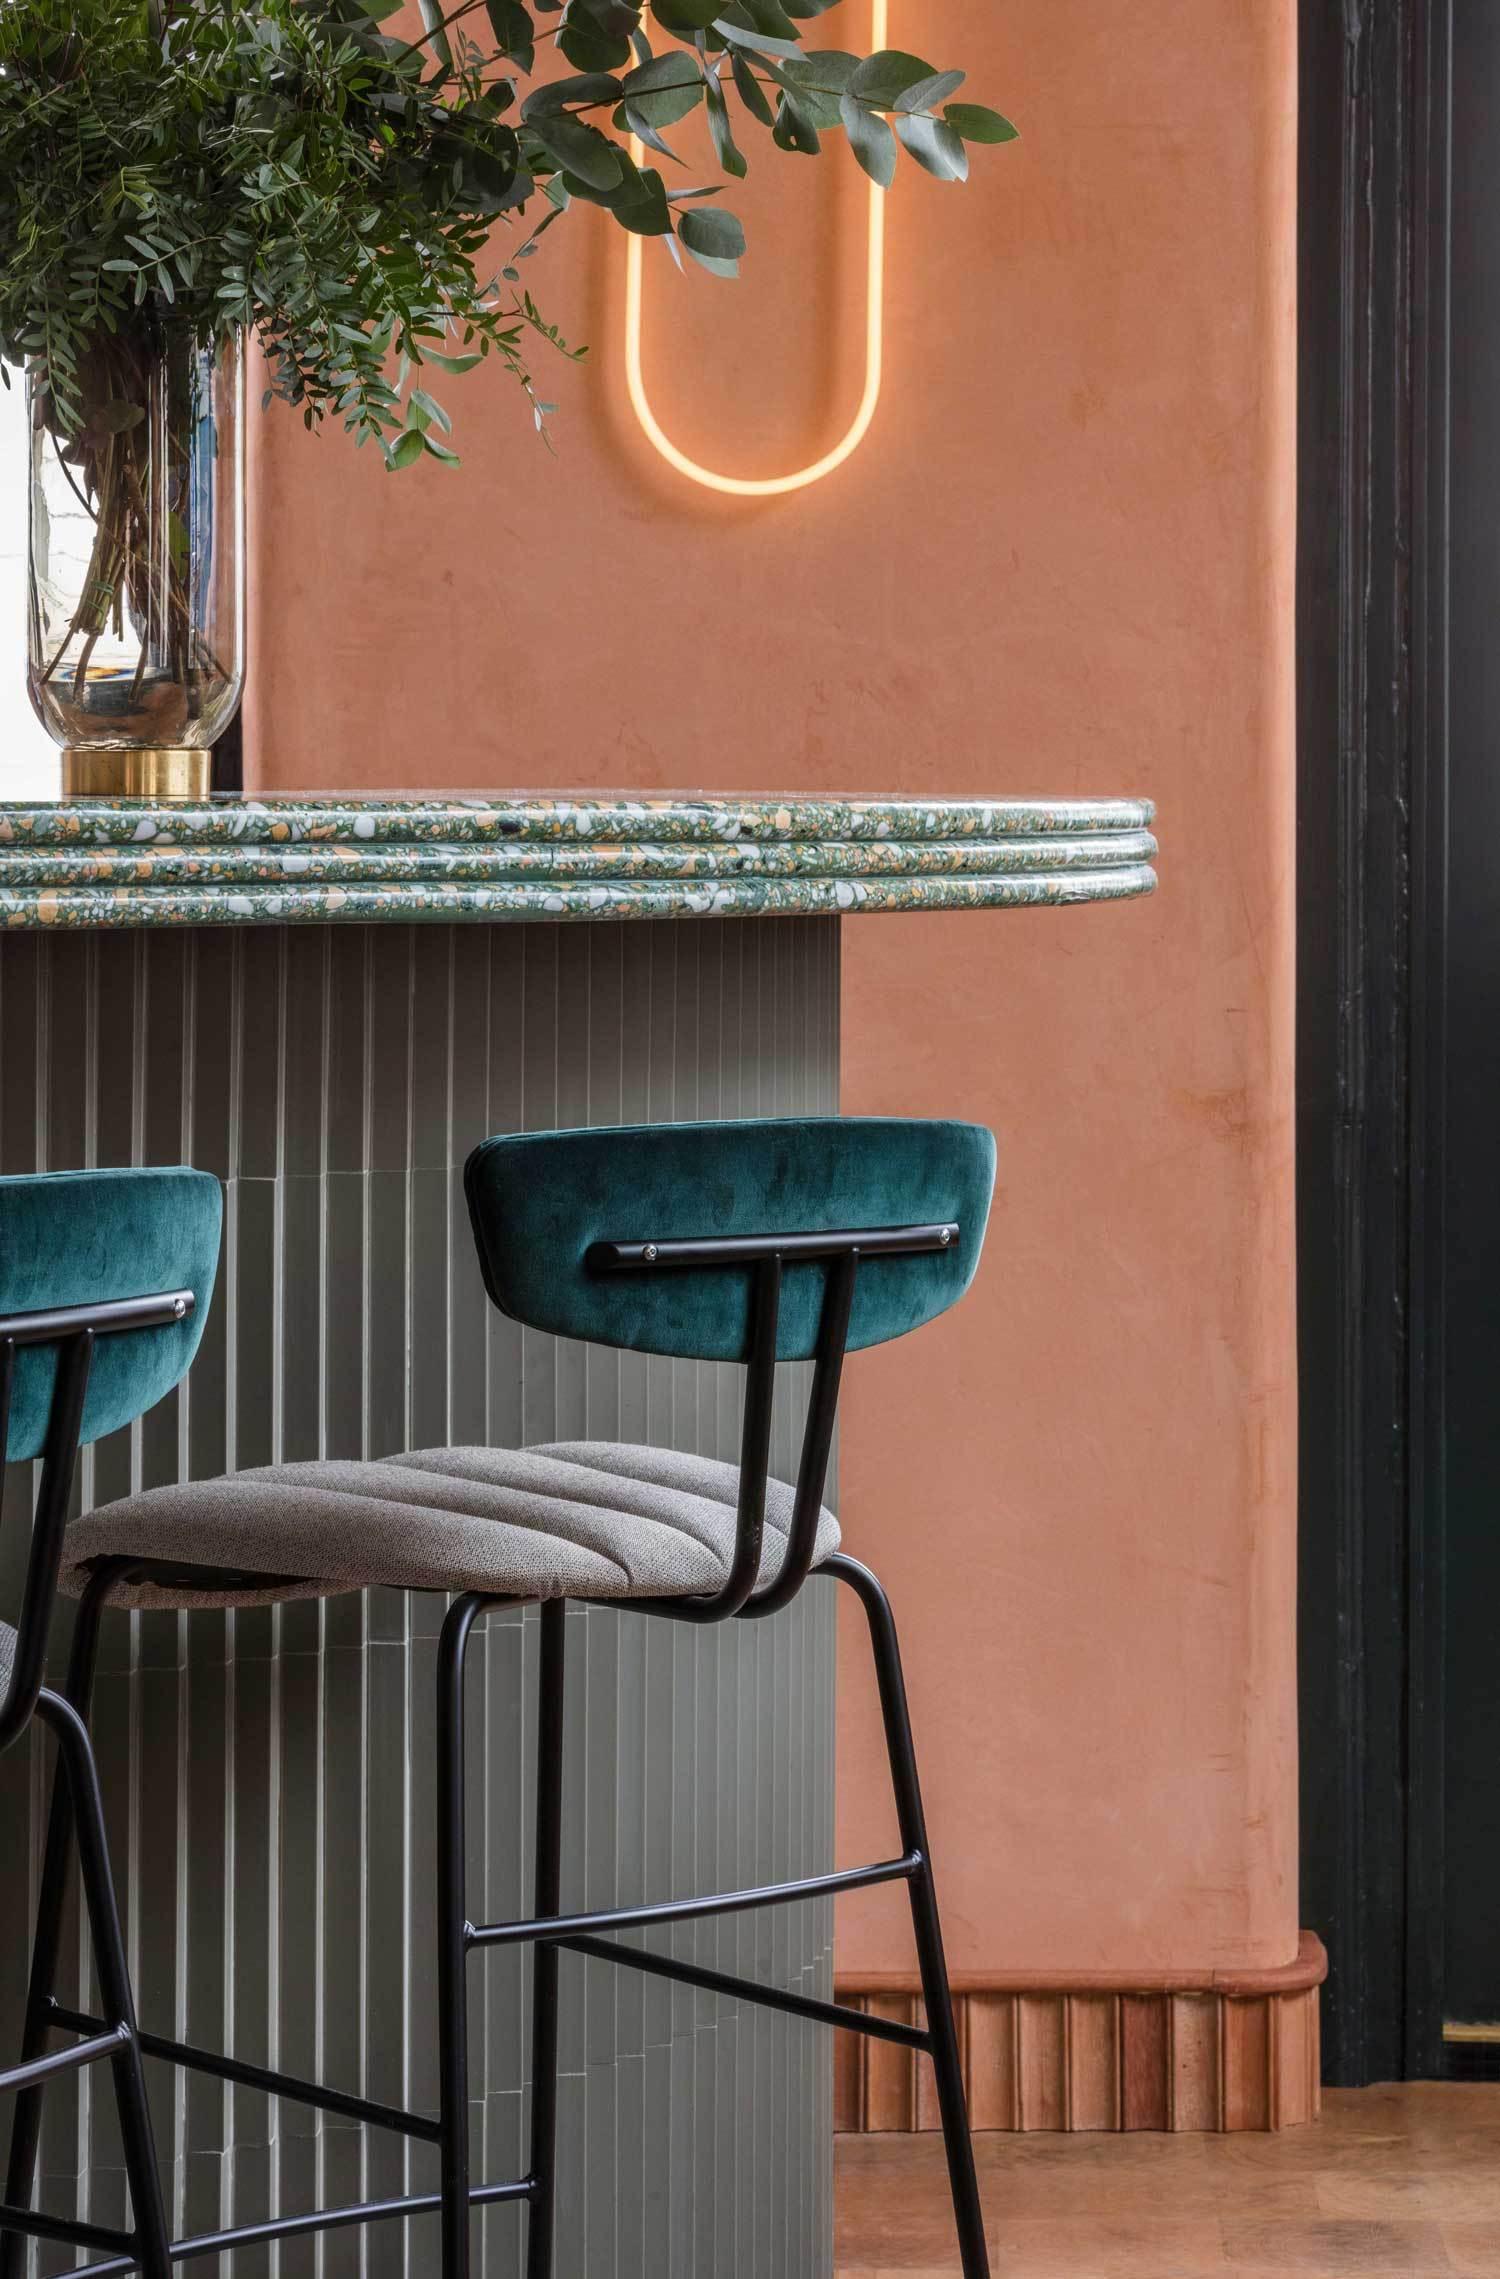 omars-place-stella-concept-restaurant-london-8.jpg